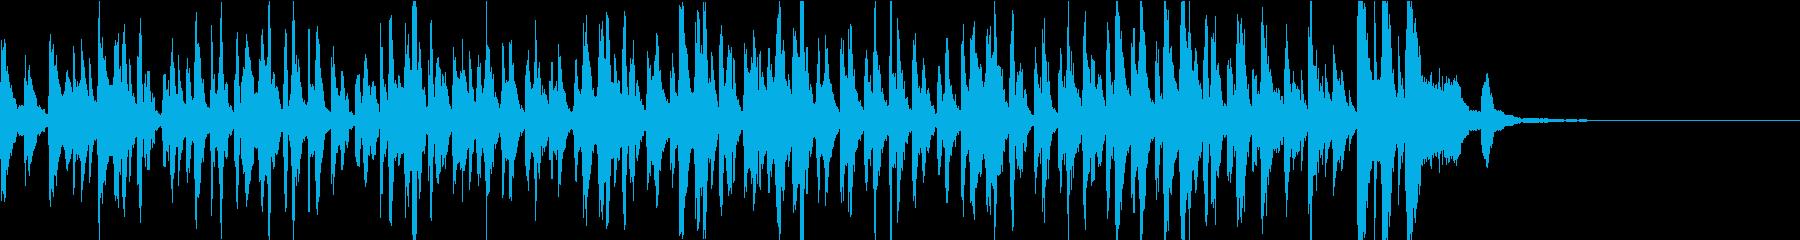 Jazz Musicの再生済みの波形